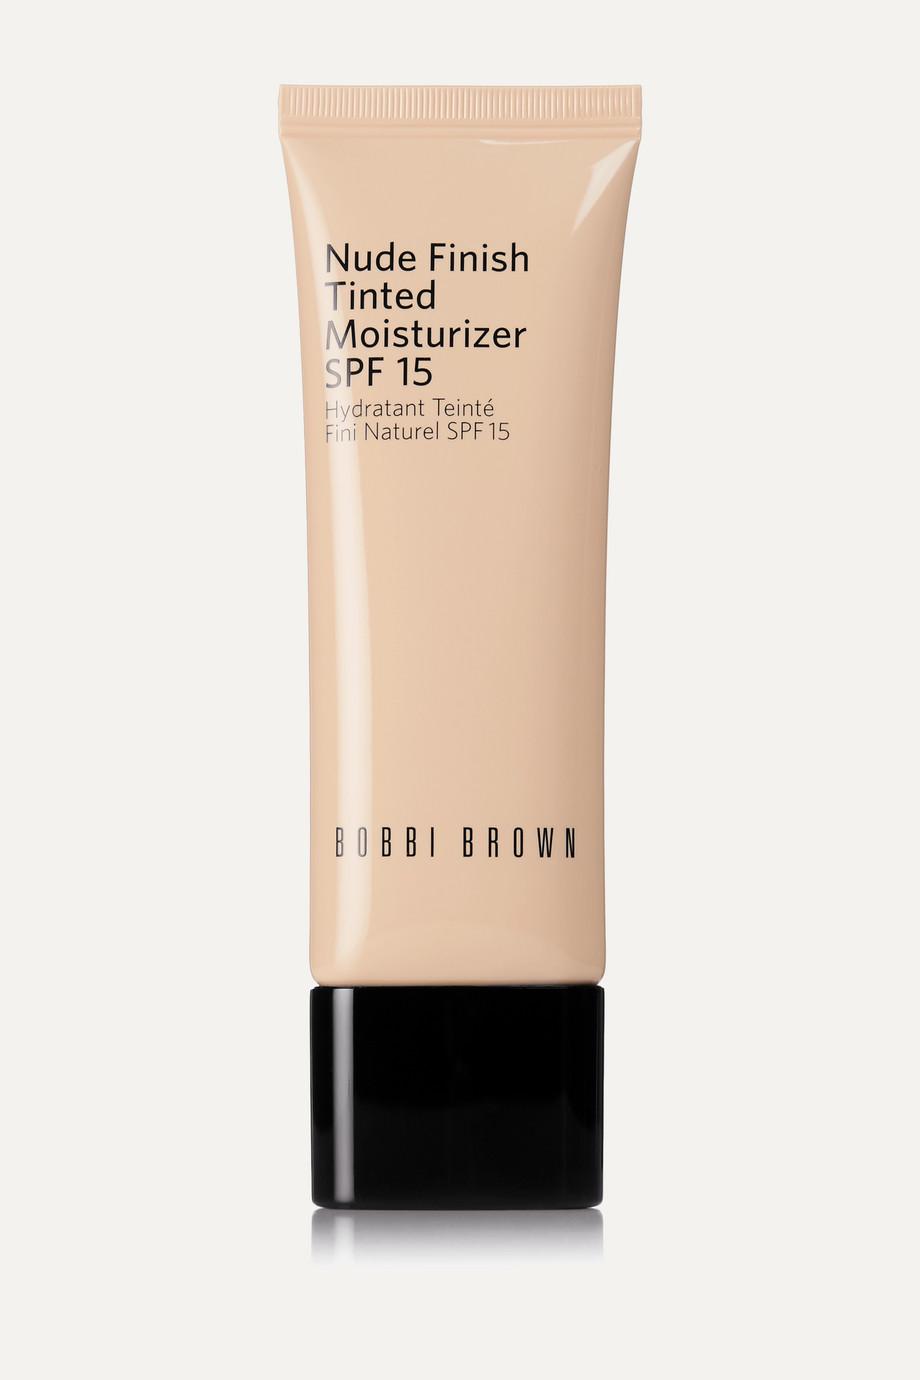 Bobbi Brown Nude Finish Tinted Moisturizer SPF15 - Light Tint